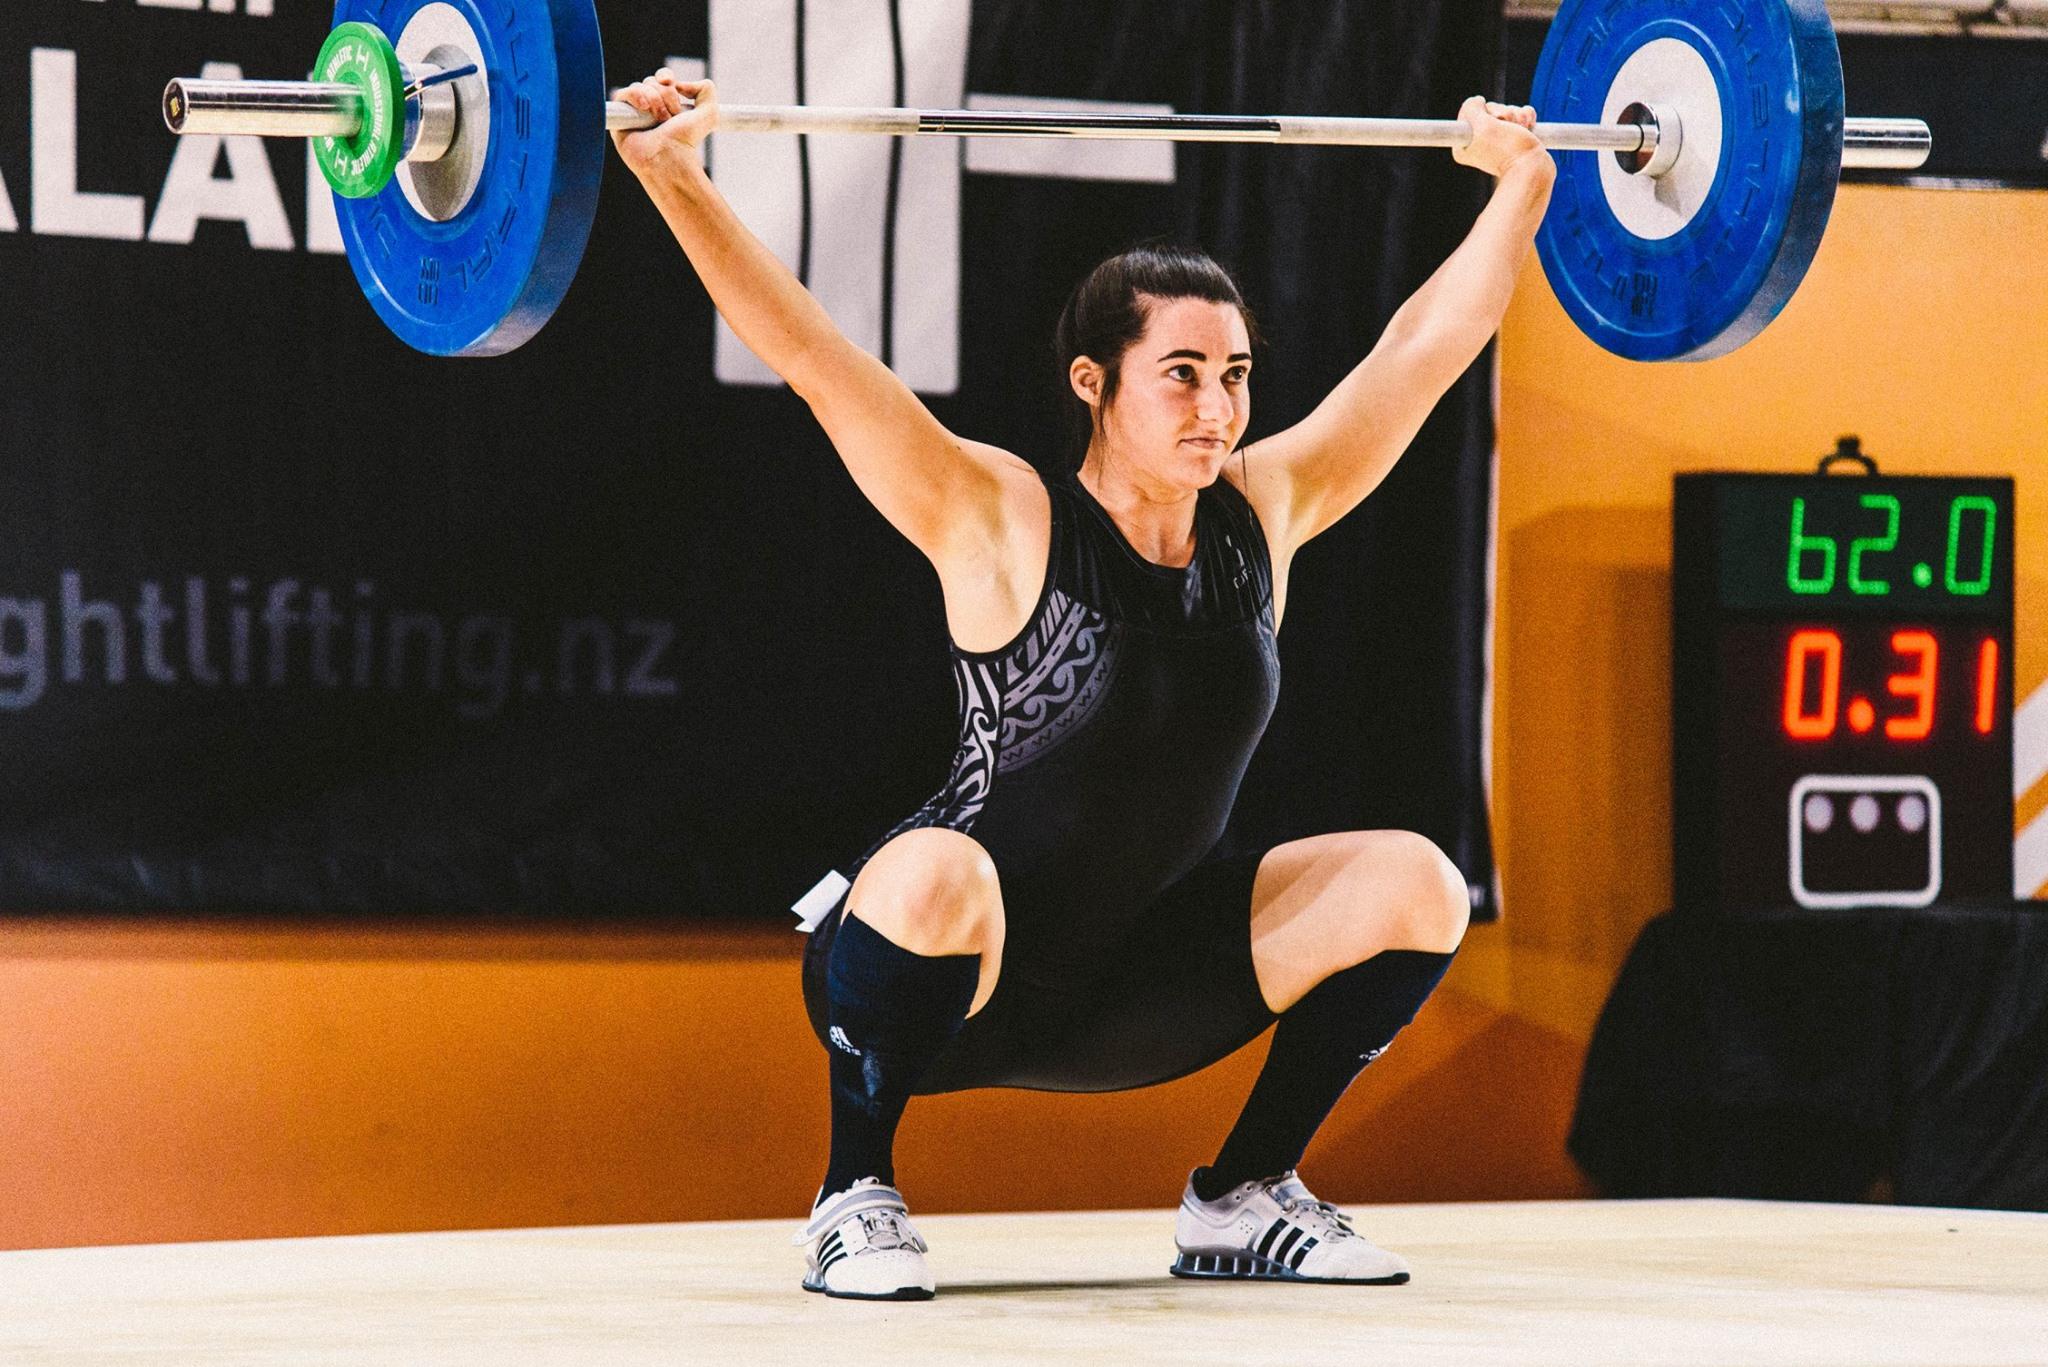 Custom Olympic Weightlifting Singlet